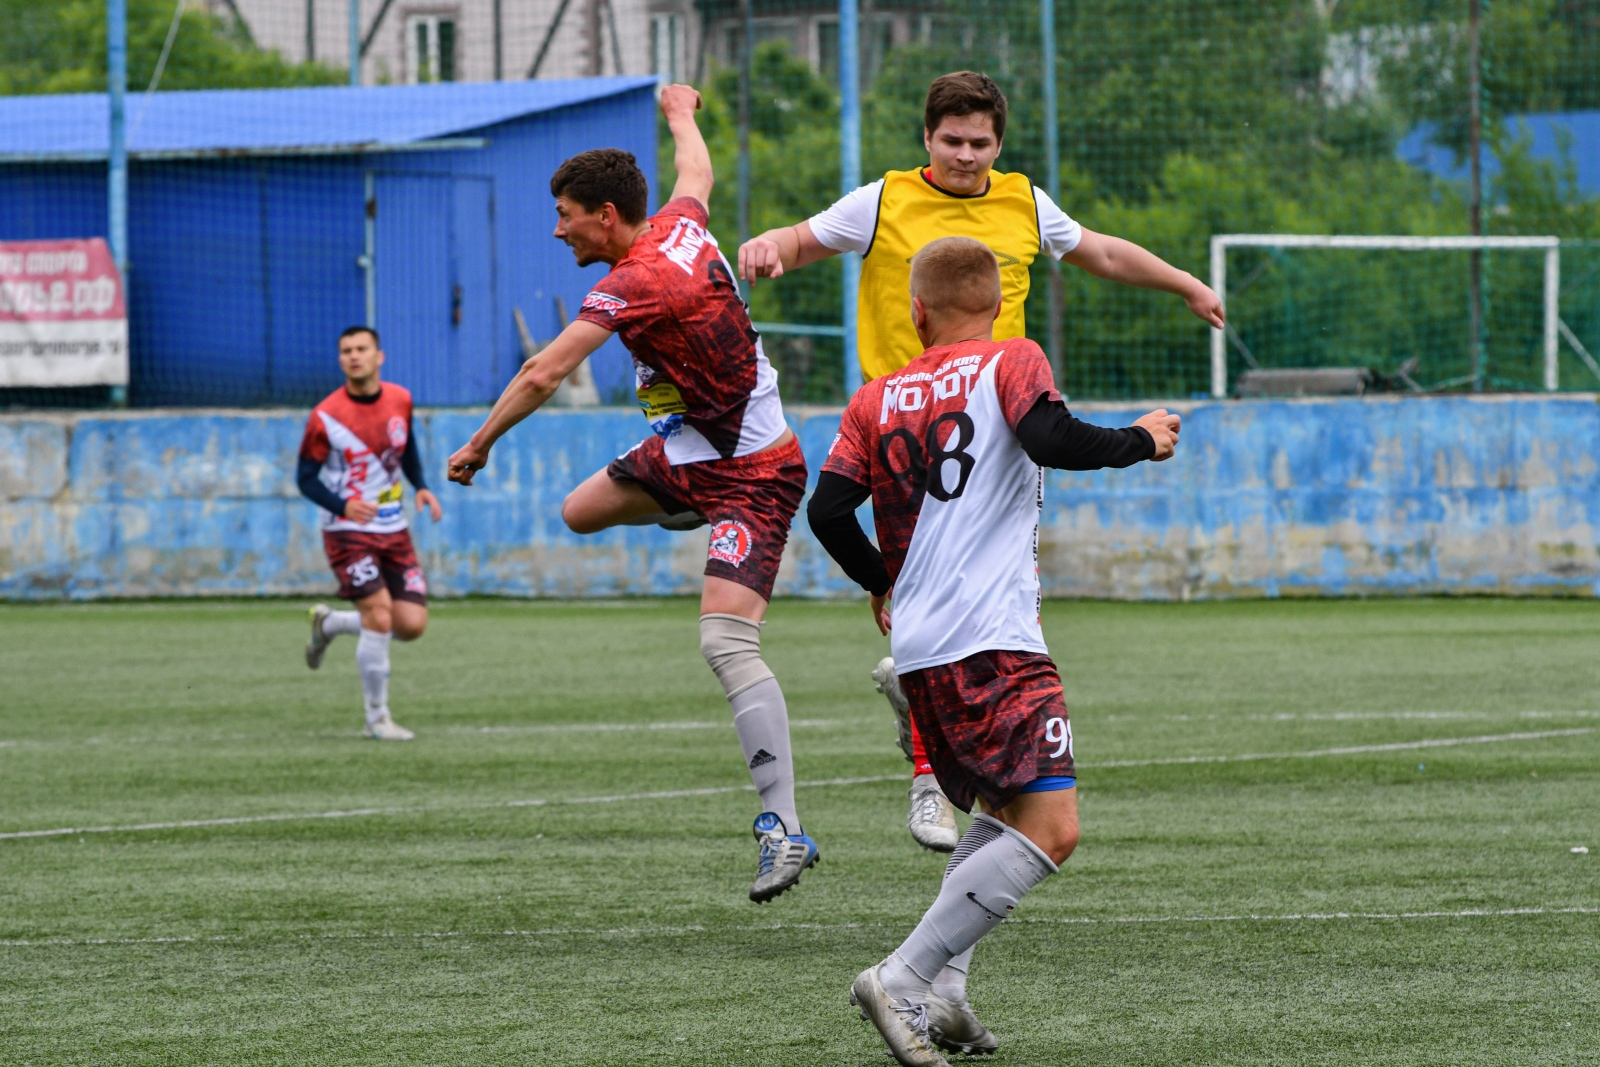 Новости футбола. Владивосток футбол. 2 лига Владивостока по футболу. Футбол в Приморском крае